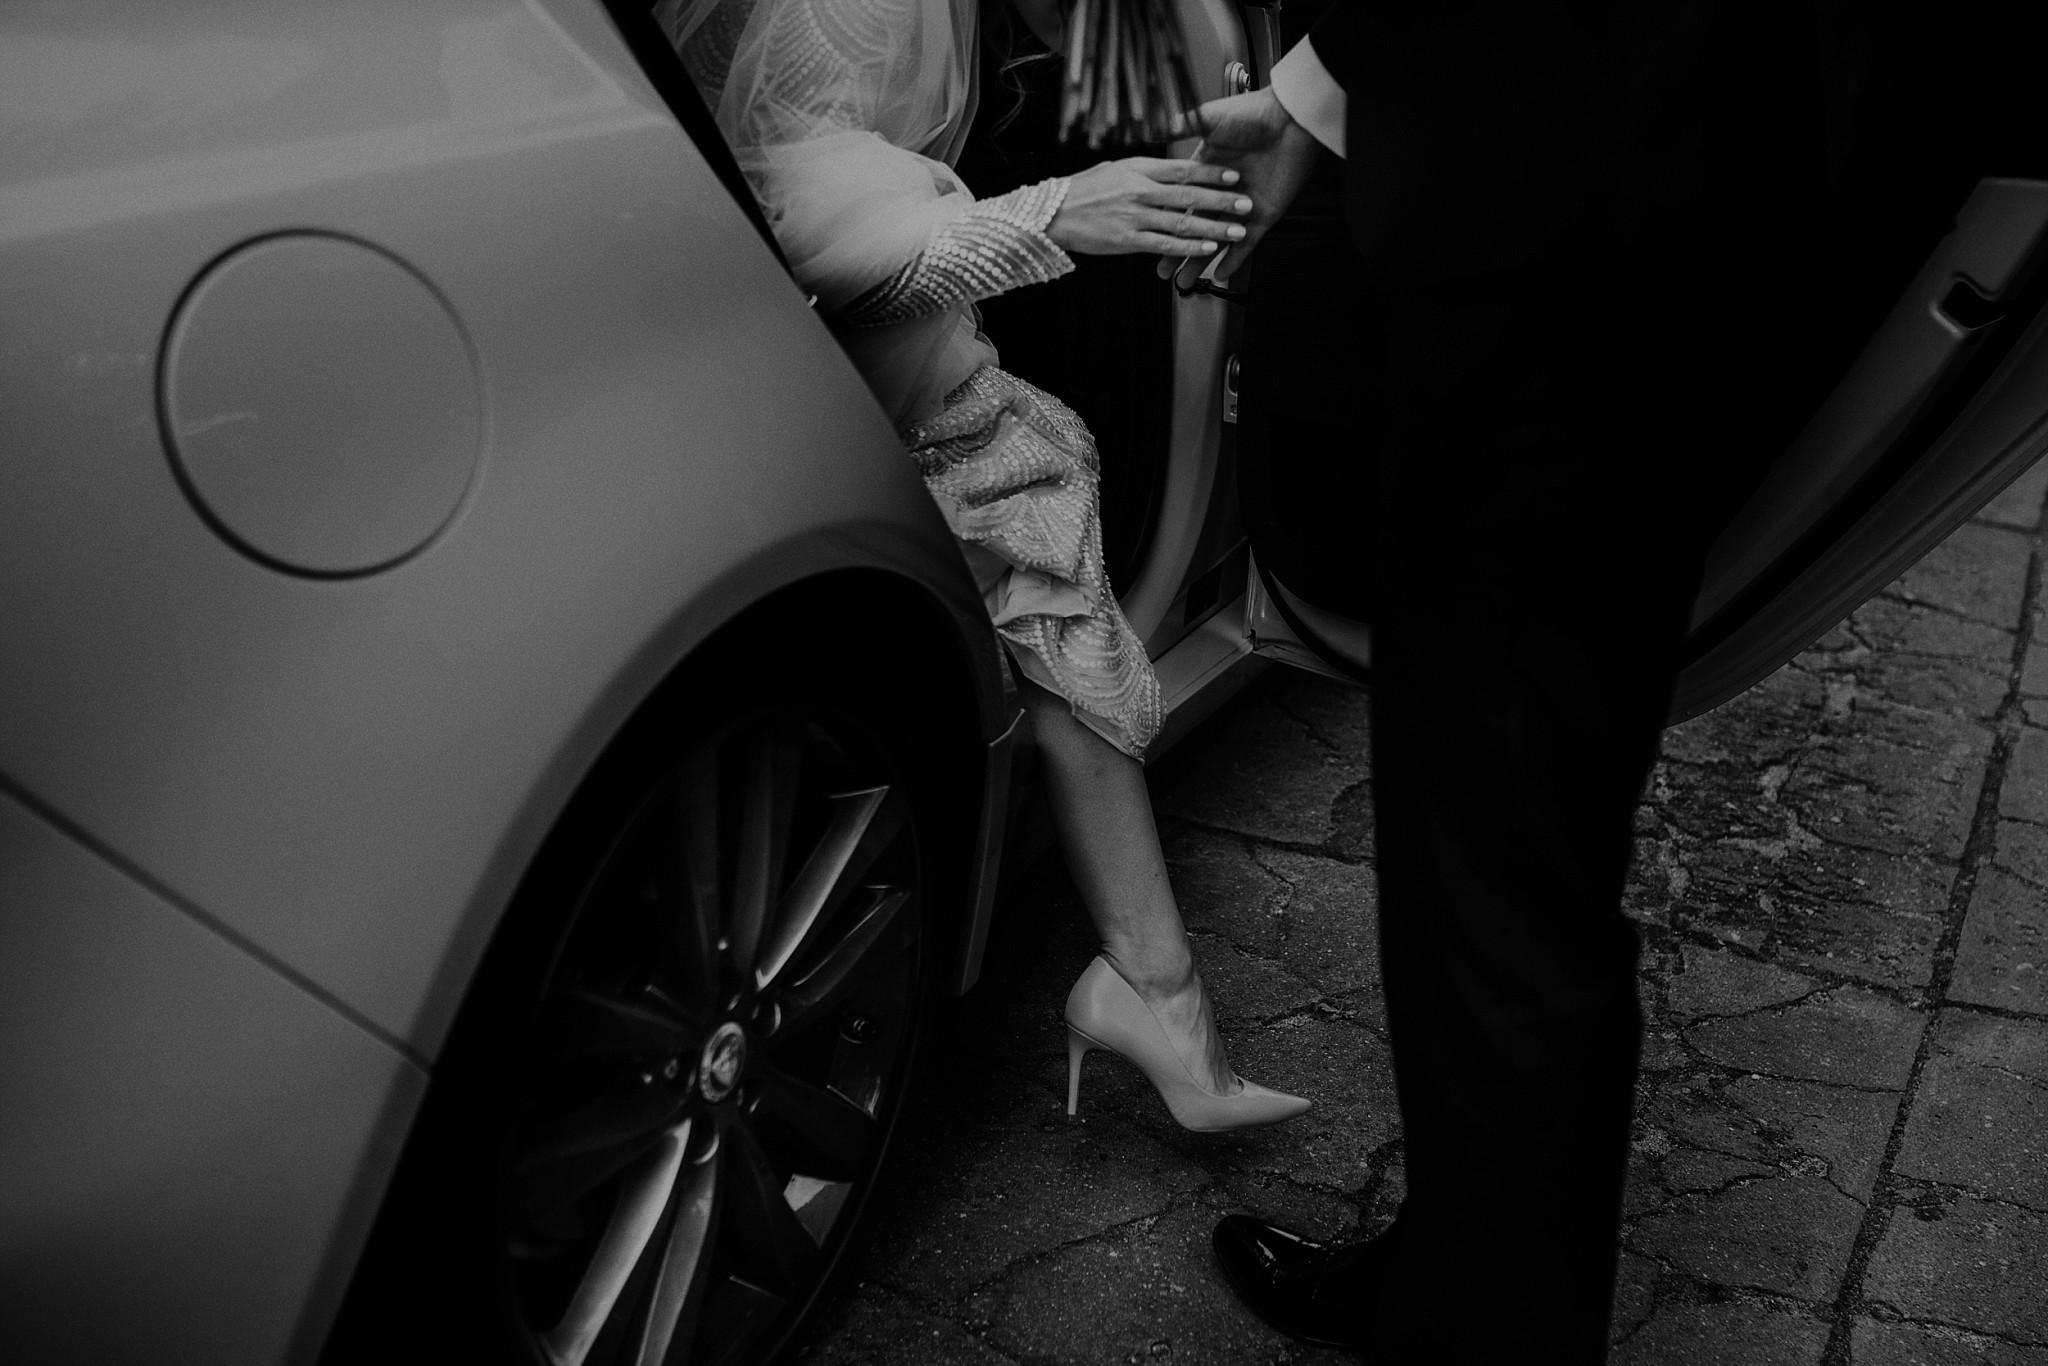 fotograf poznan wesele dobra truskawka piekne wesele pod poznaniem wesele w dobrej truskawce piekna para mloda slub marzen slub koronawirus slub listopad wesele koronawirus 126